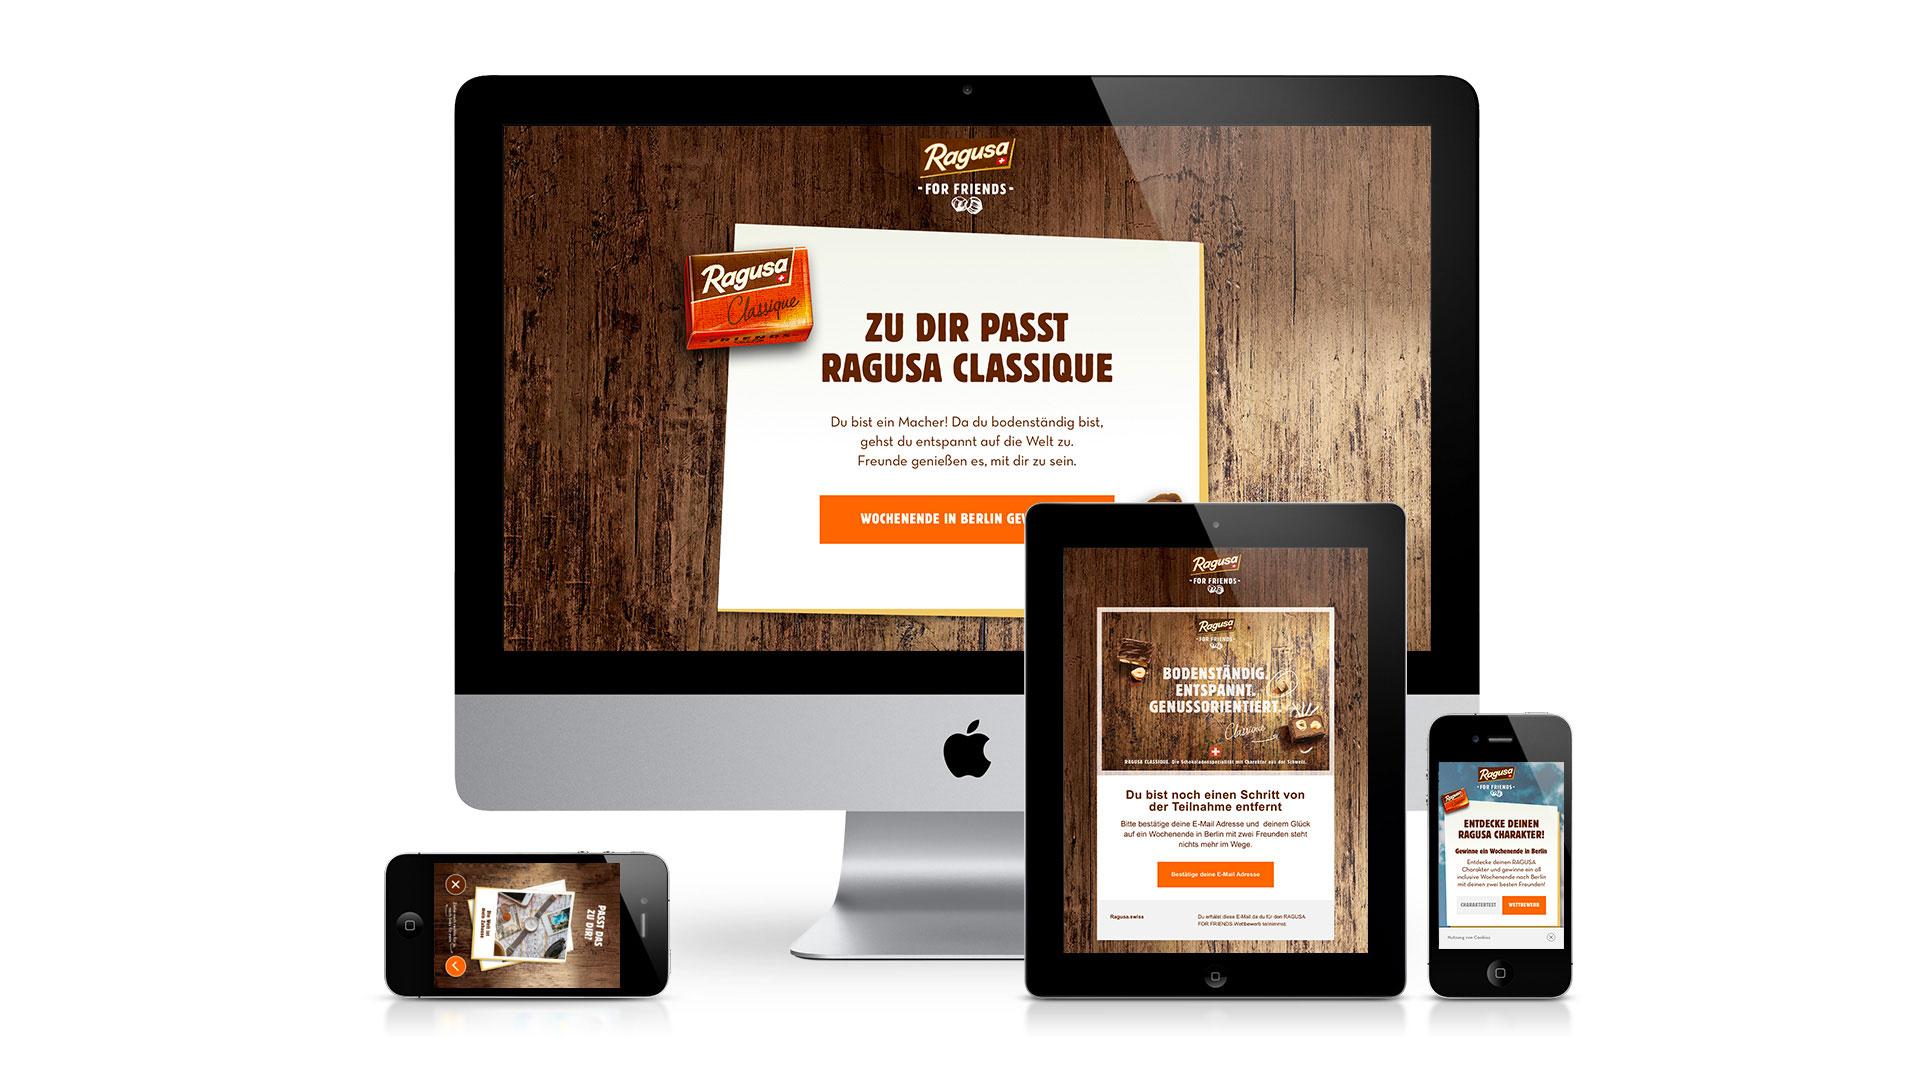 Case Study Mockup iPhone 3 Ragusa Win INTERNAL 170609